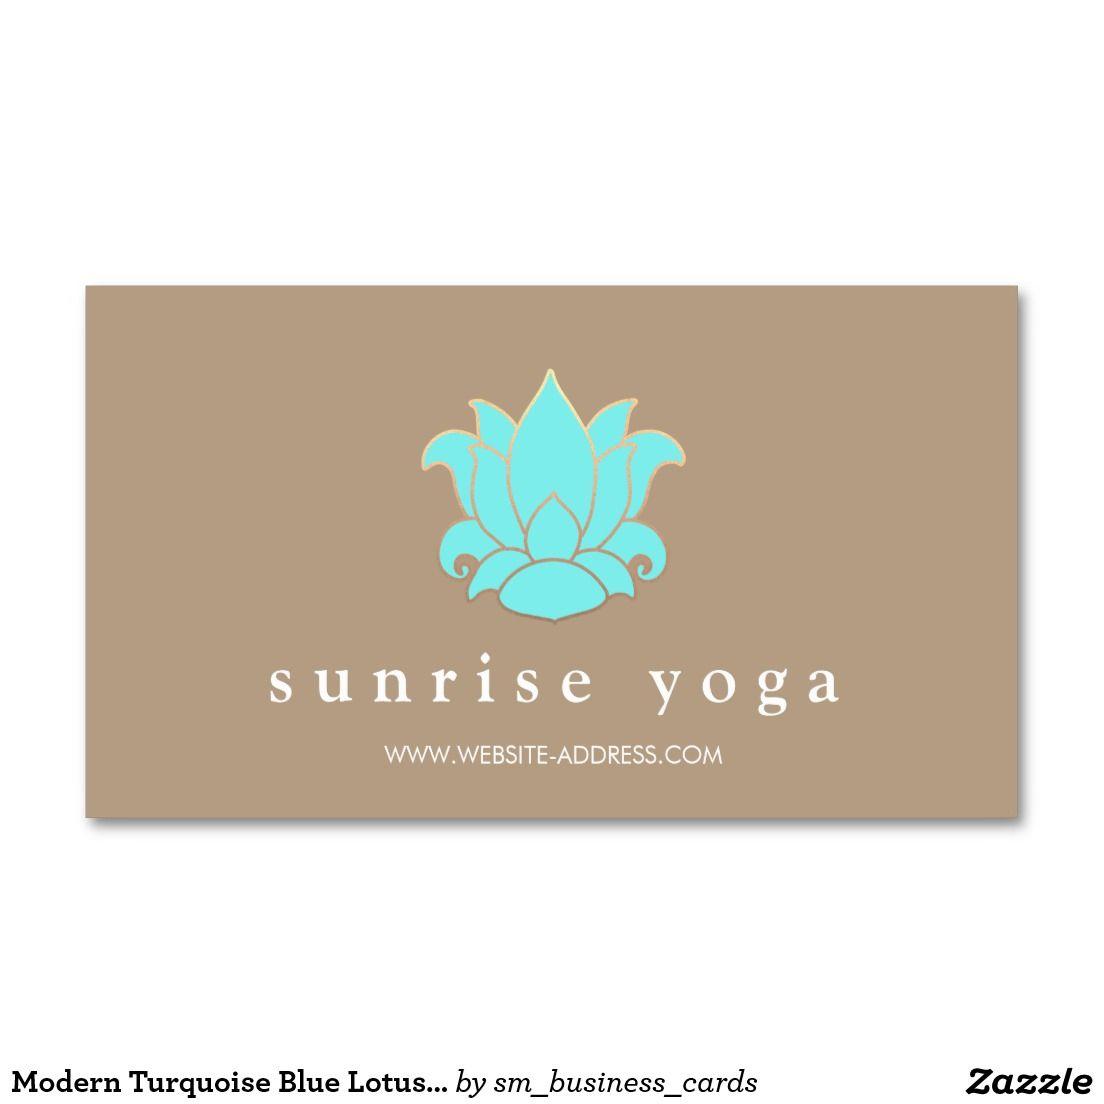 Modern turquoise blue lotus yoga instructor business card business modern turquoise blue lotus yoga instructor business card colourmoves